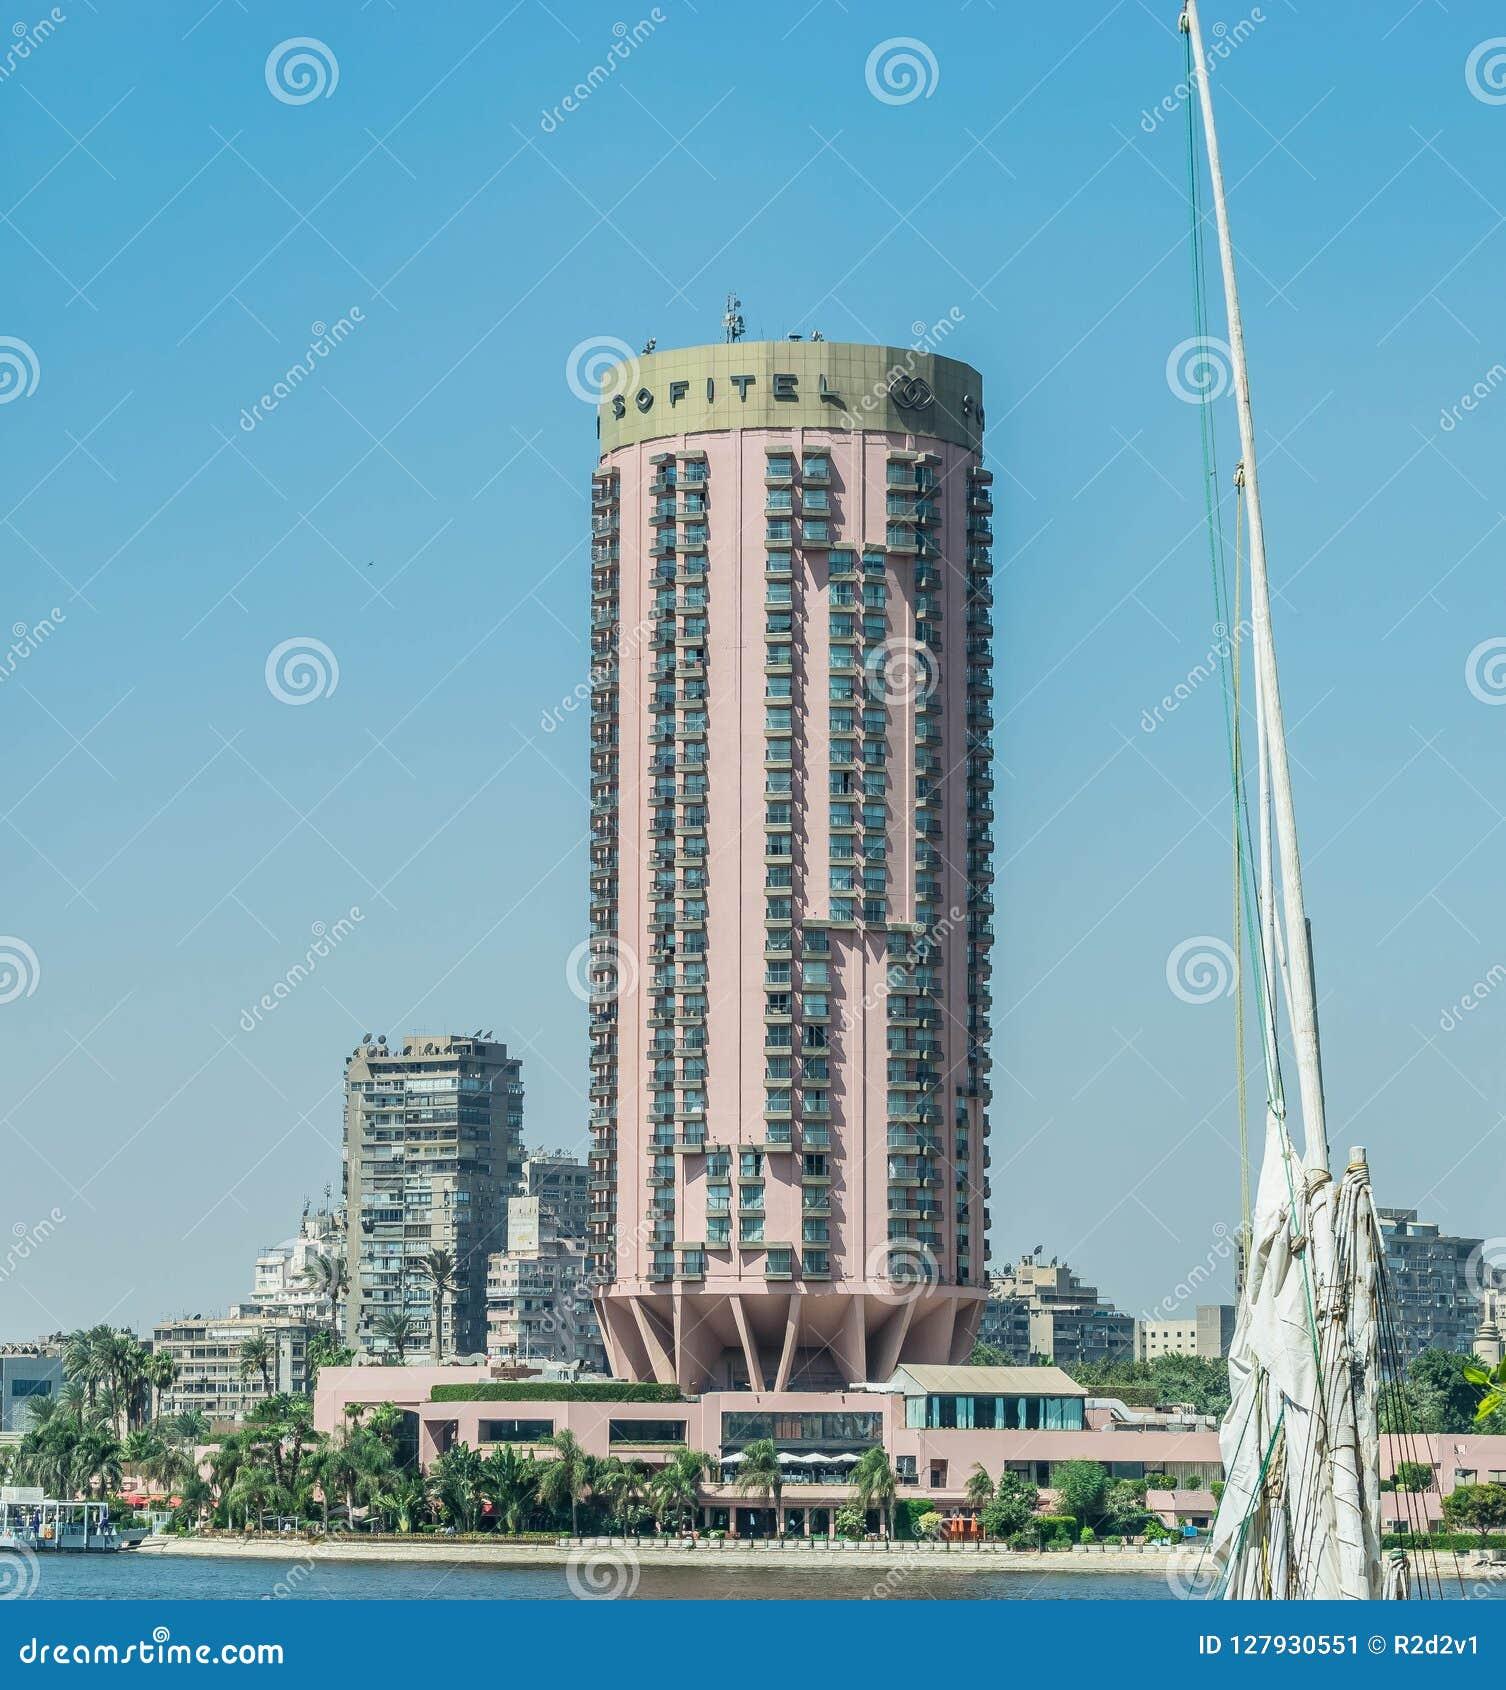 HotellSofitel Kairo Nile El Gezirah